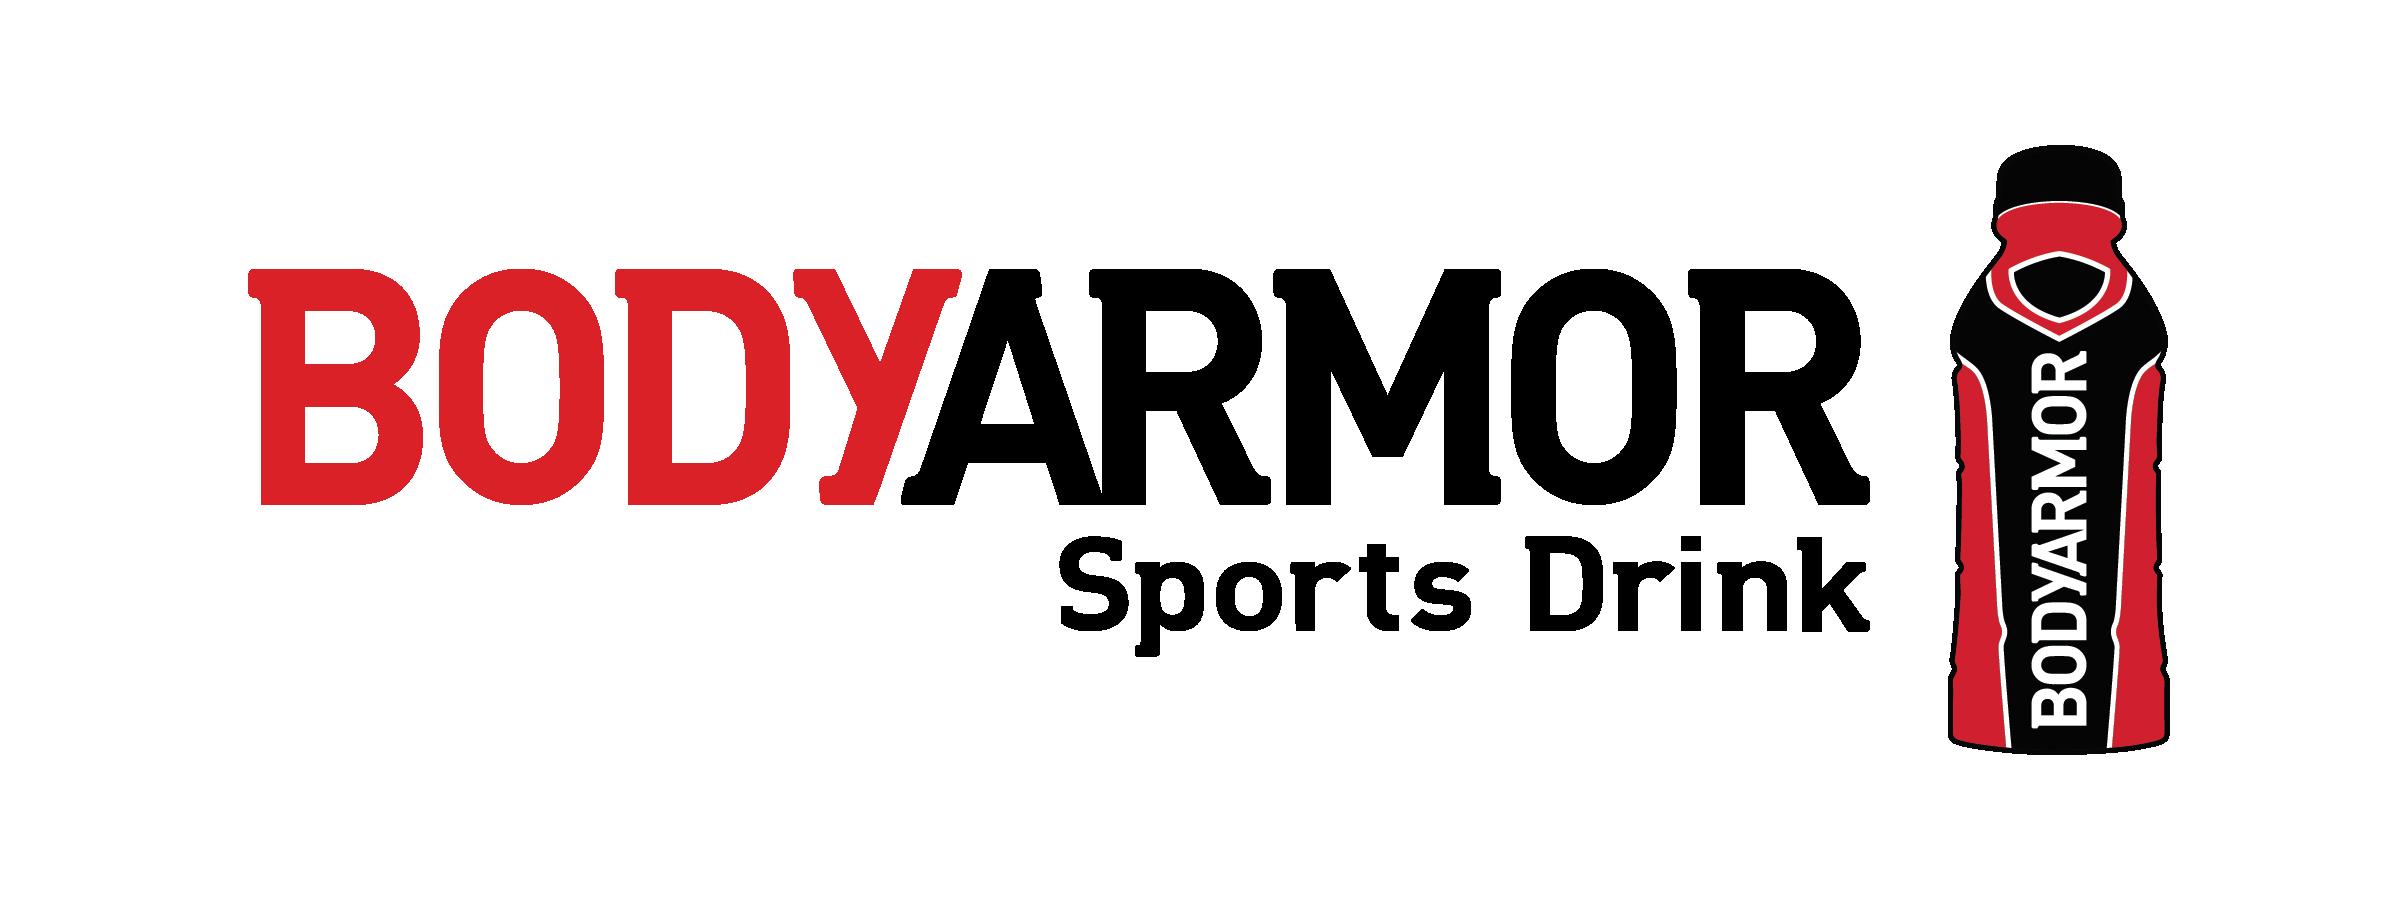 Sponsor BODYARMOR